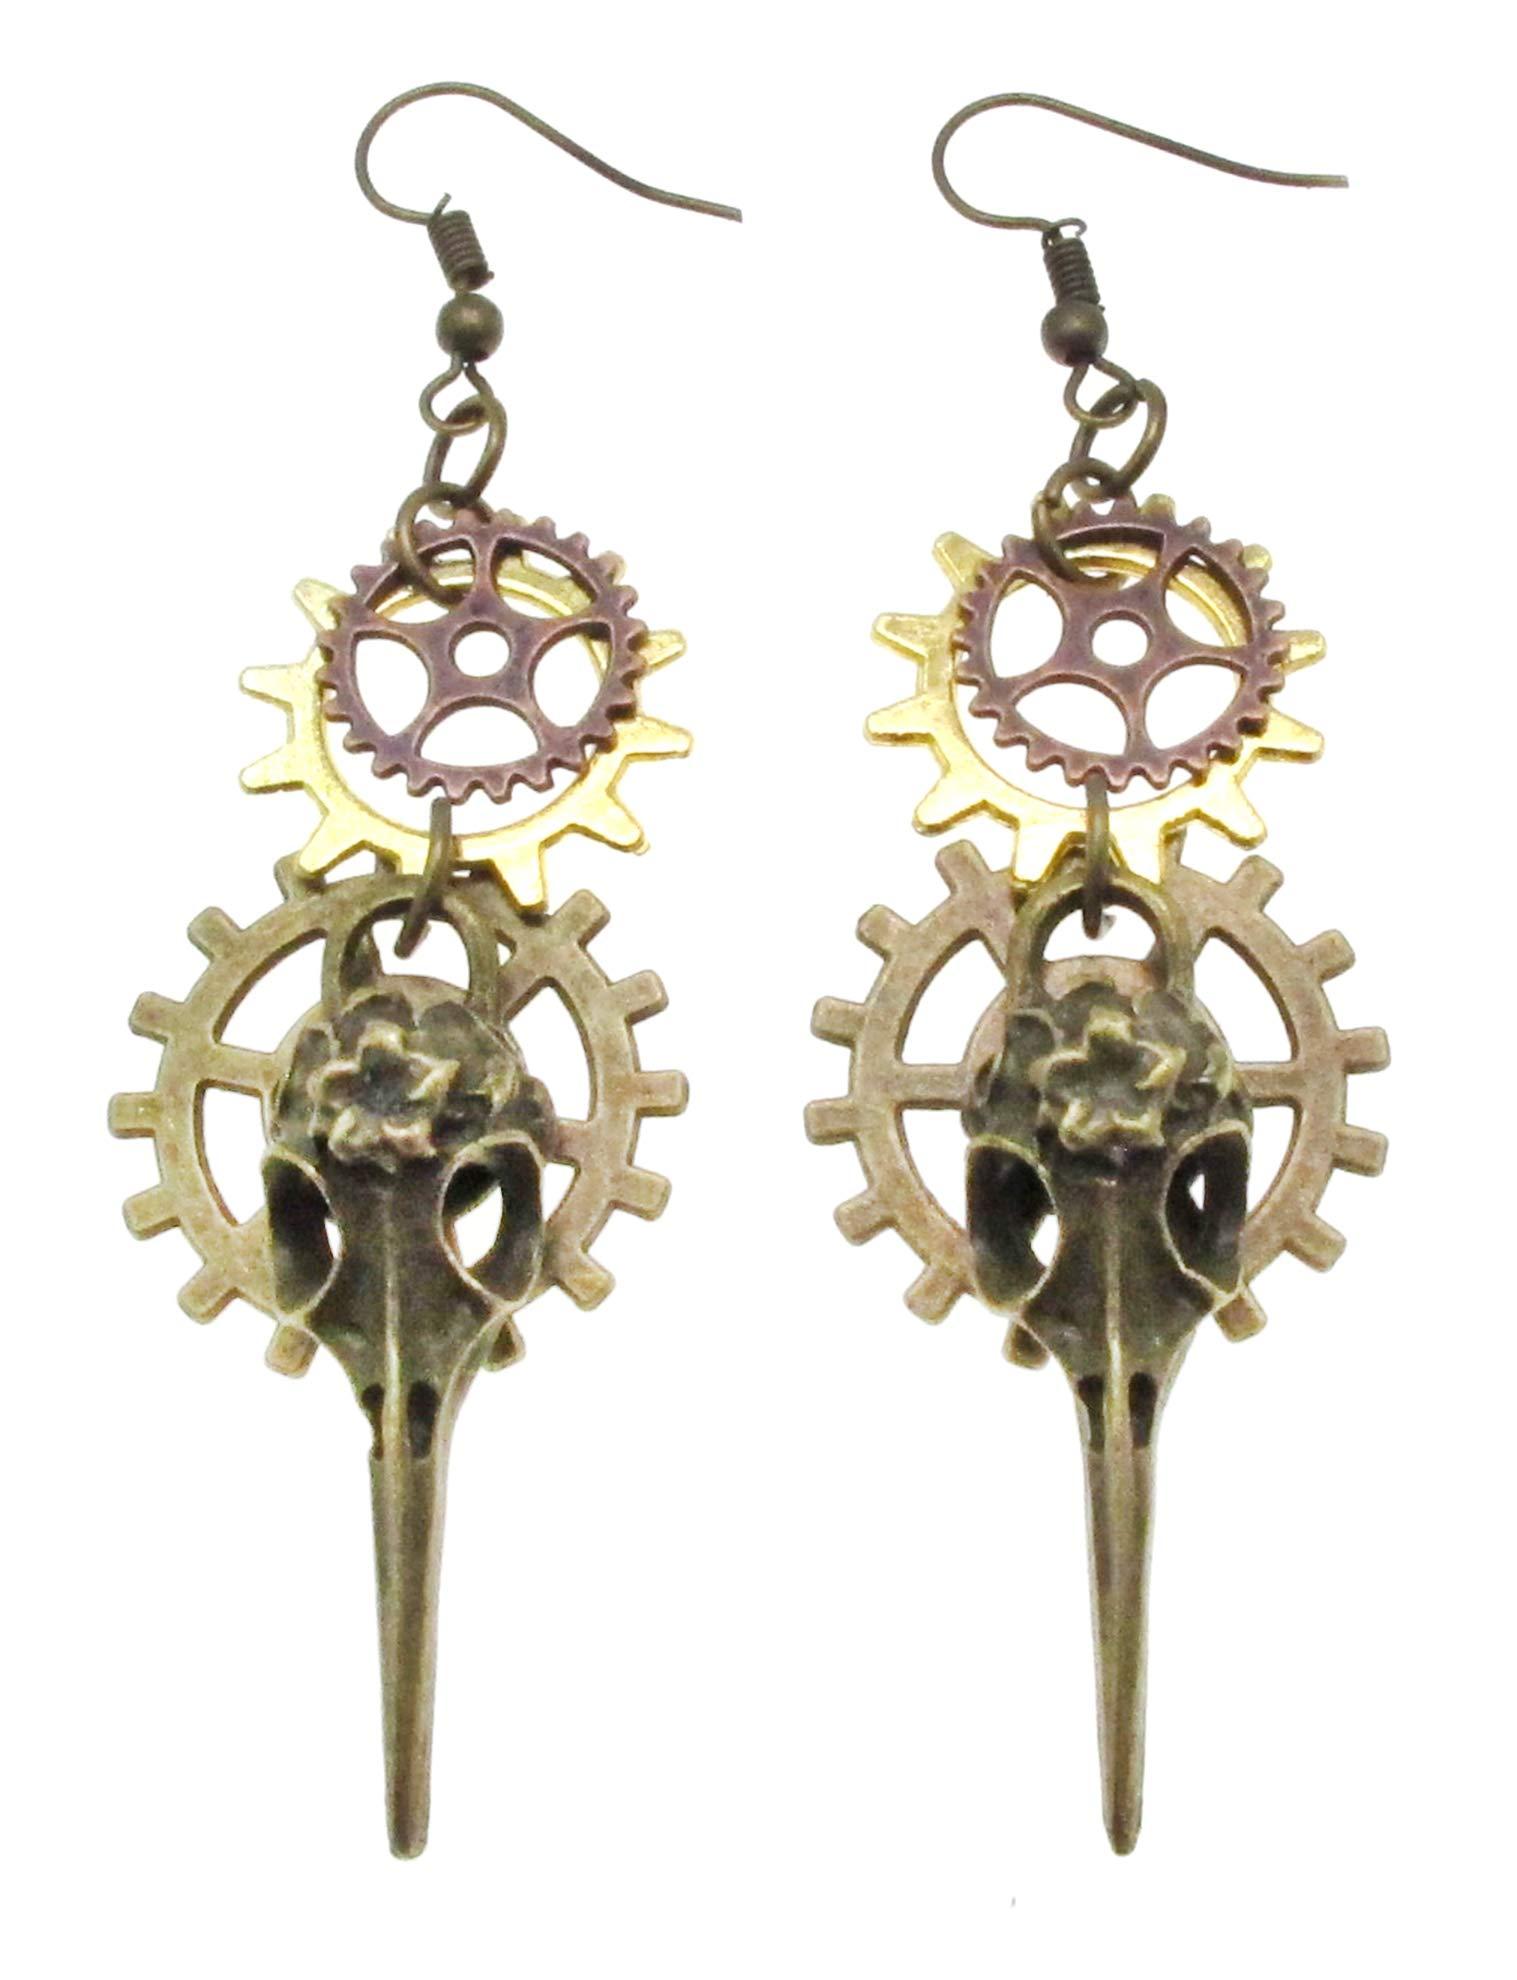 SAE99 Steampunk Gear Collection Dangle Drop Earrings 3